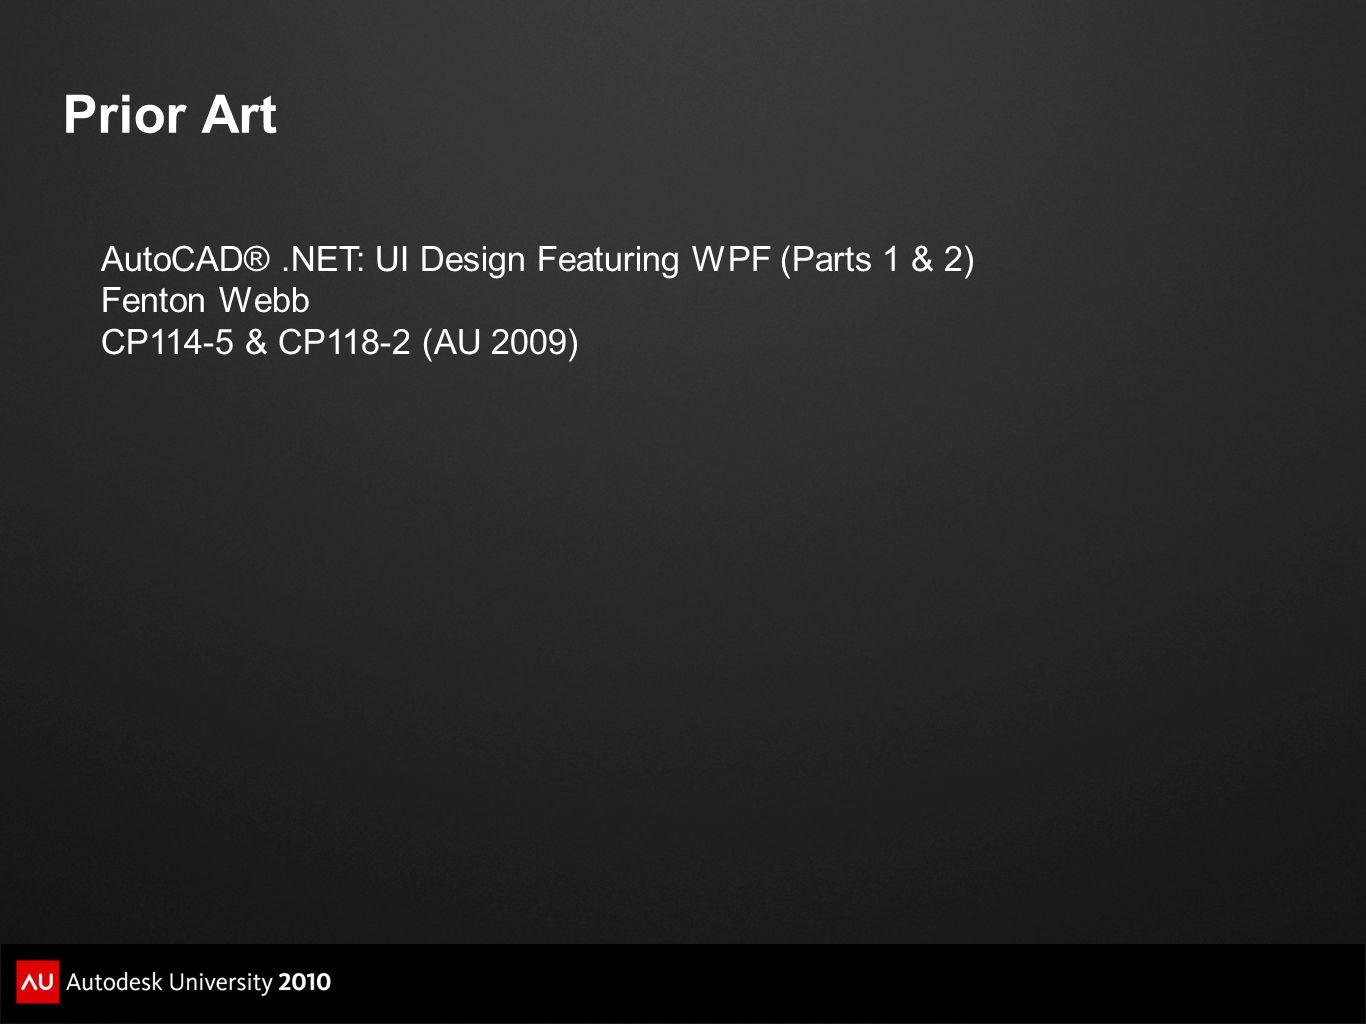 Prior Art AutoCAD®.NET: UI Design Featuring WPF (Parts 1 & 2) Fenton Webb CP114-5 & CP118-2 (AU 2009)